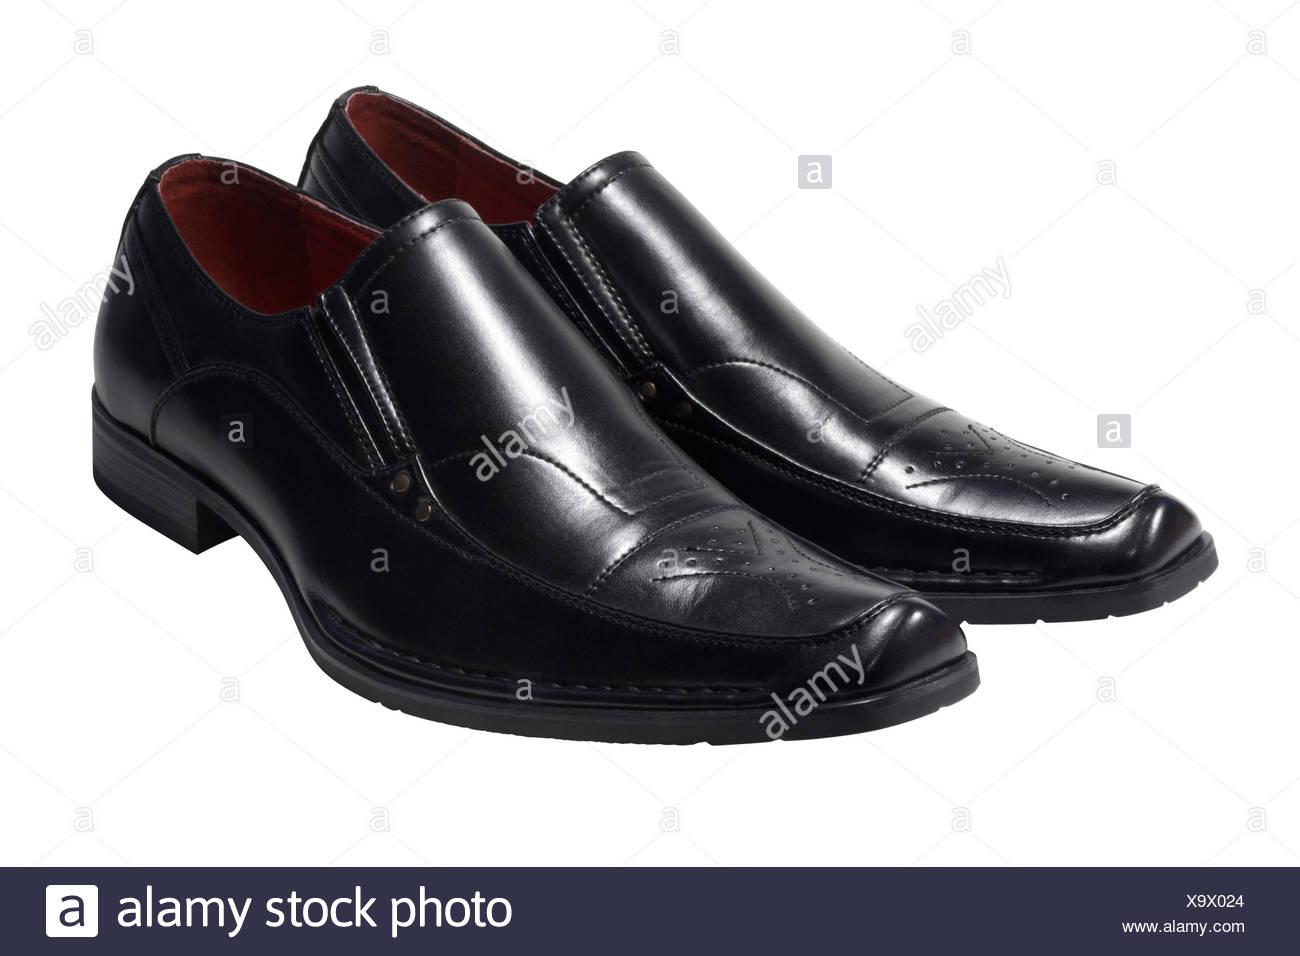 footgear, pair, shoe, shine, shines, bright, lucent, light, serene, luminous, Stock Photo